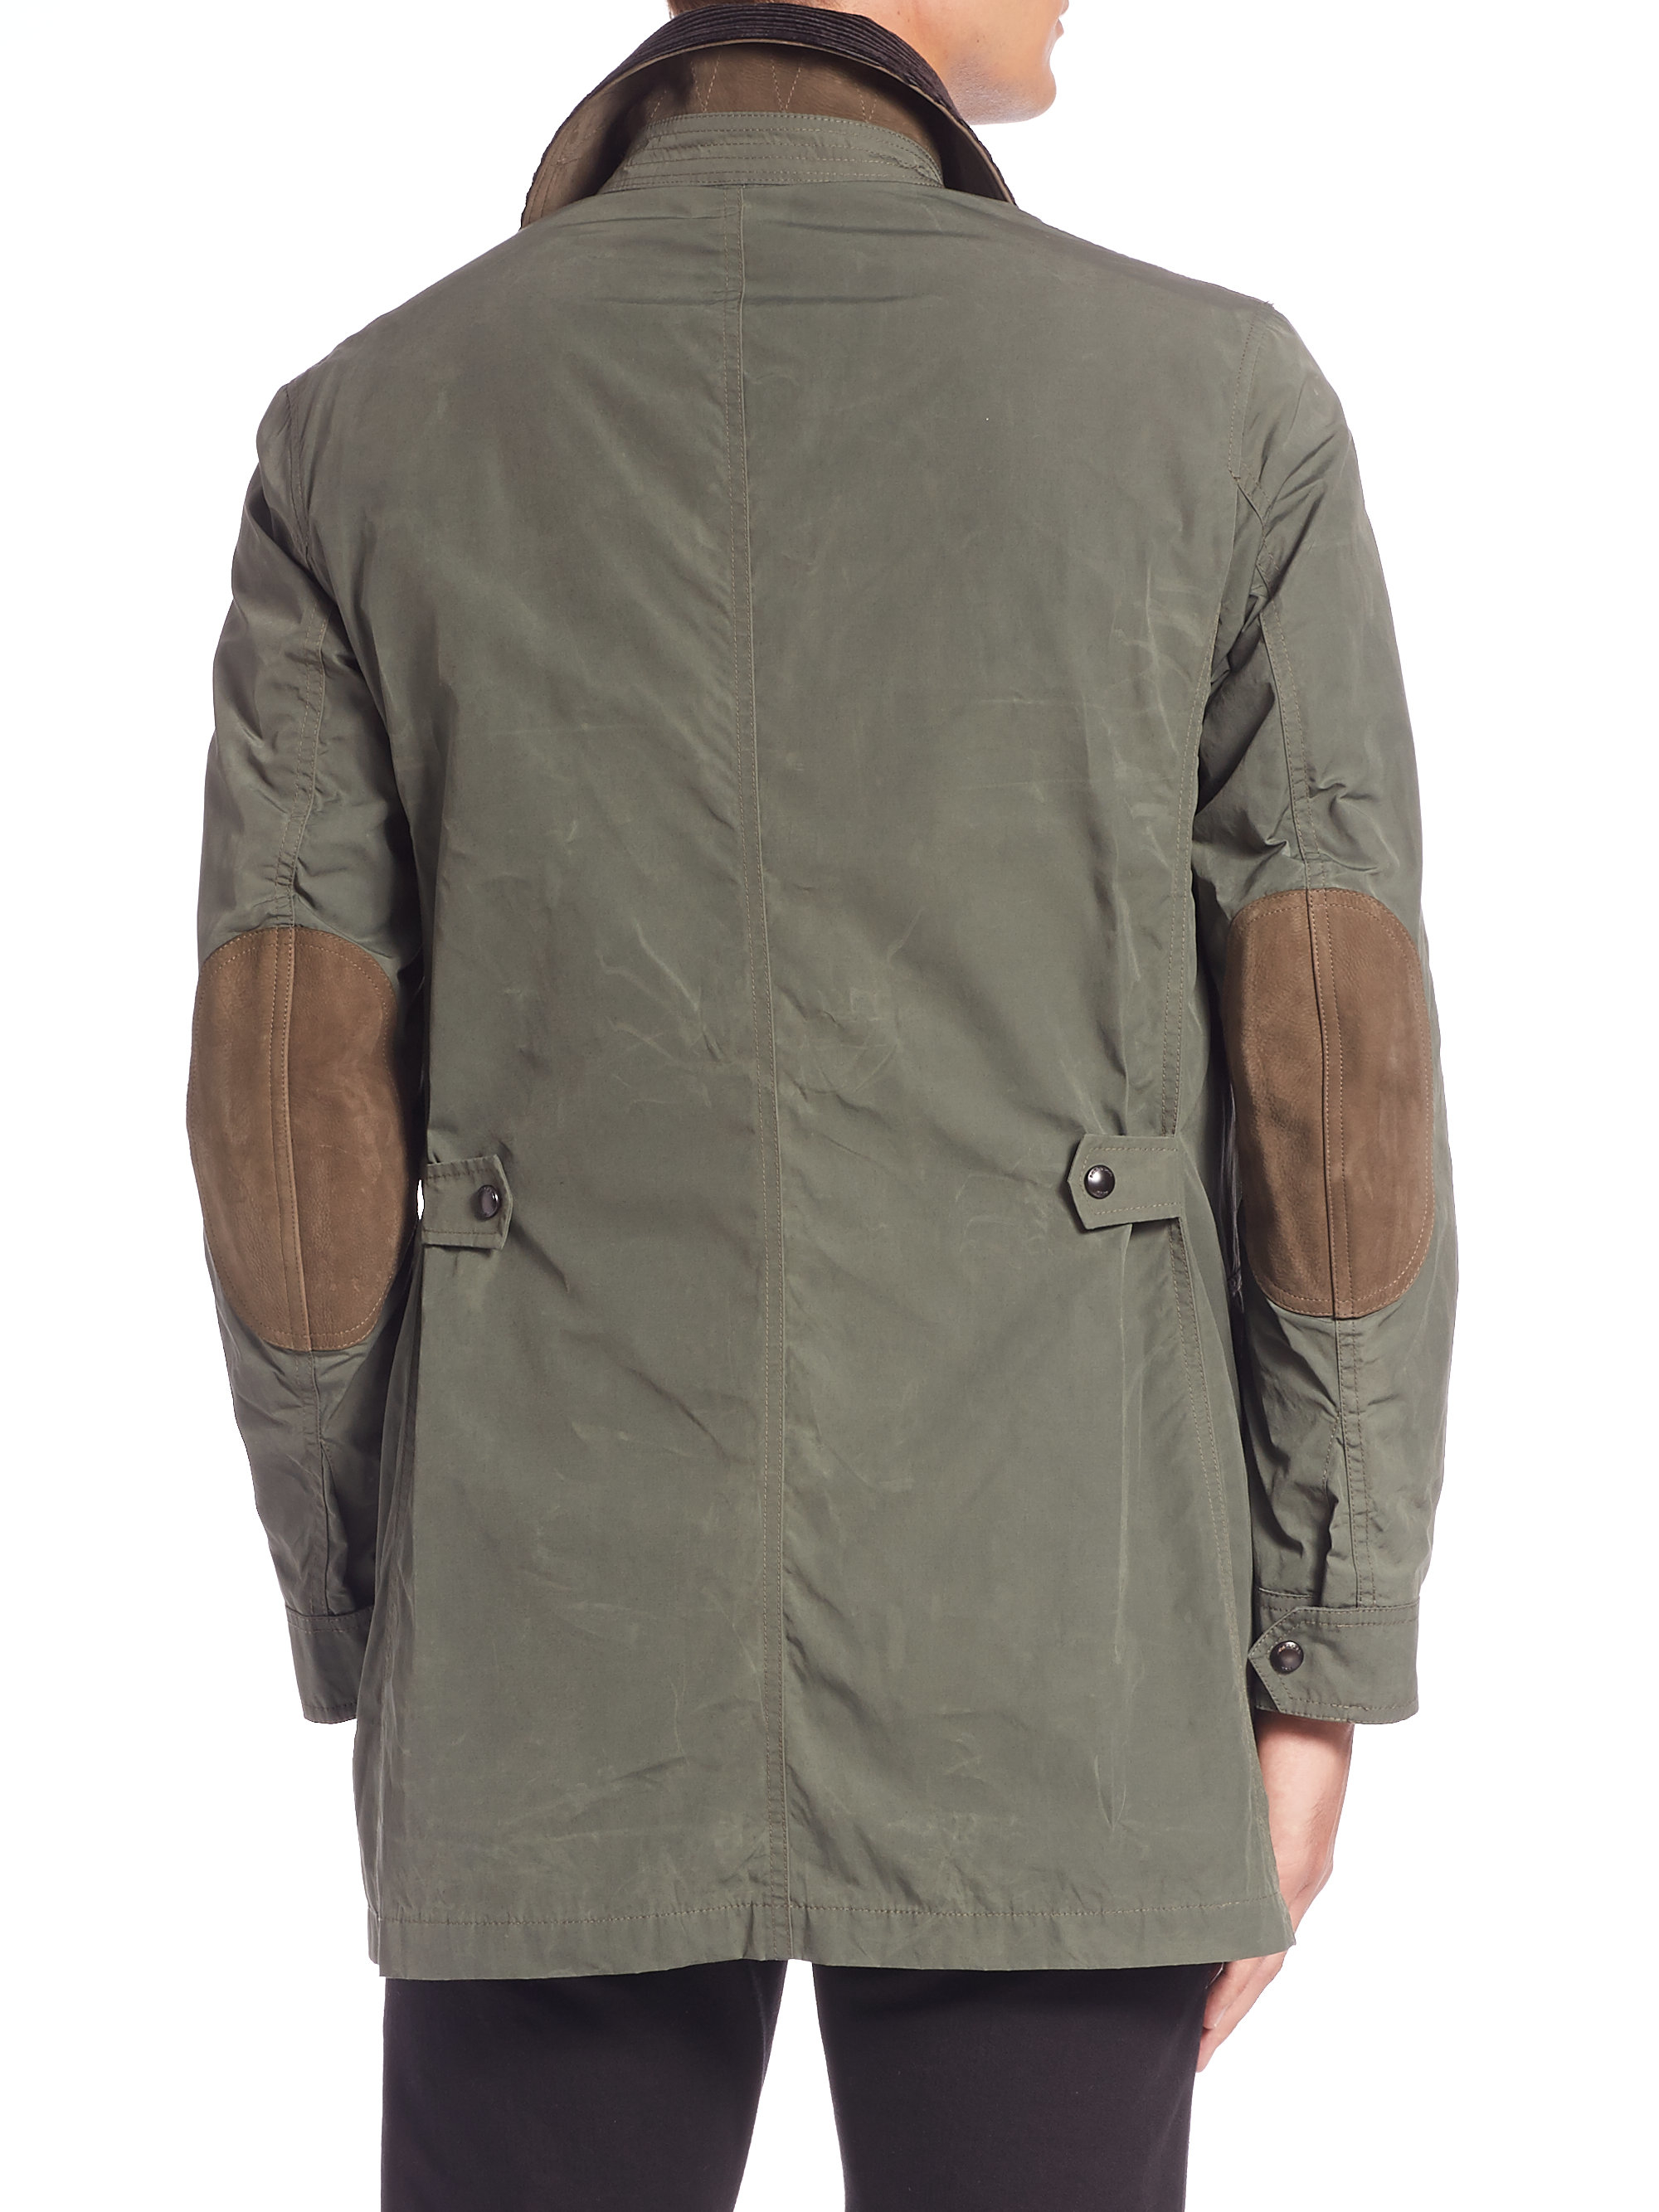 Burberry Brit Bartlett Cotton Blend Jacket In Green For